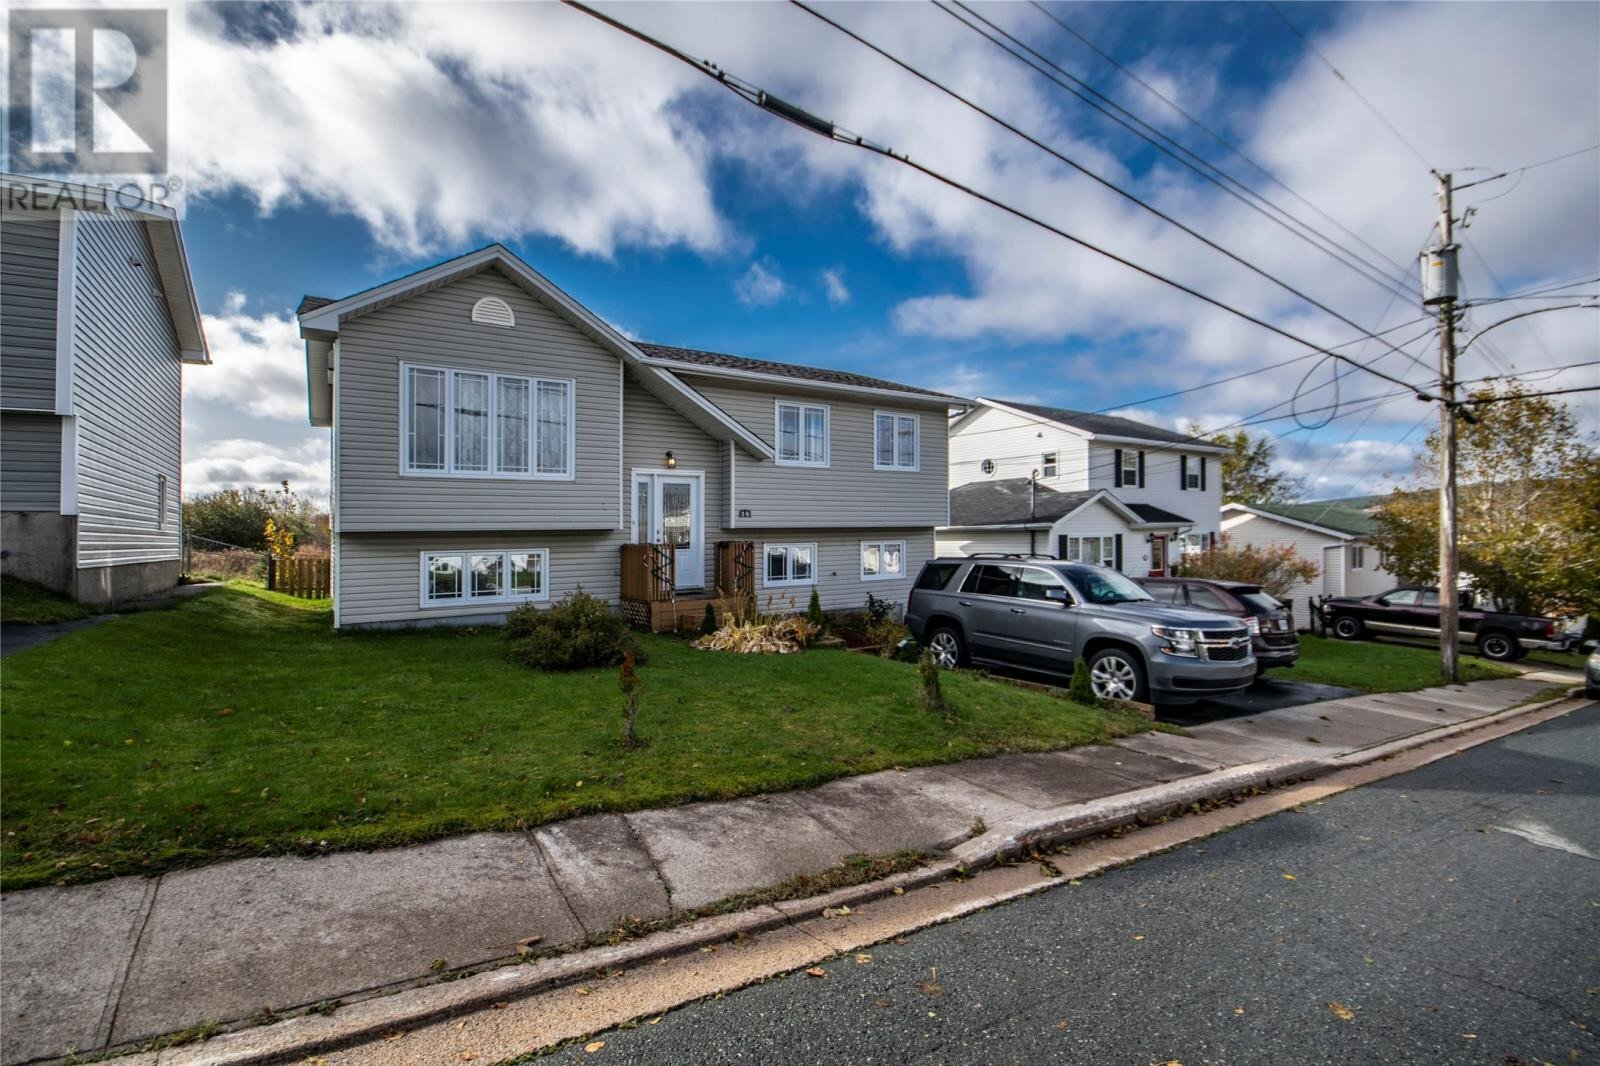 House for sale at 14 Densmore Ln St. John's Newfoundland - MLS: 1223211